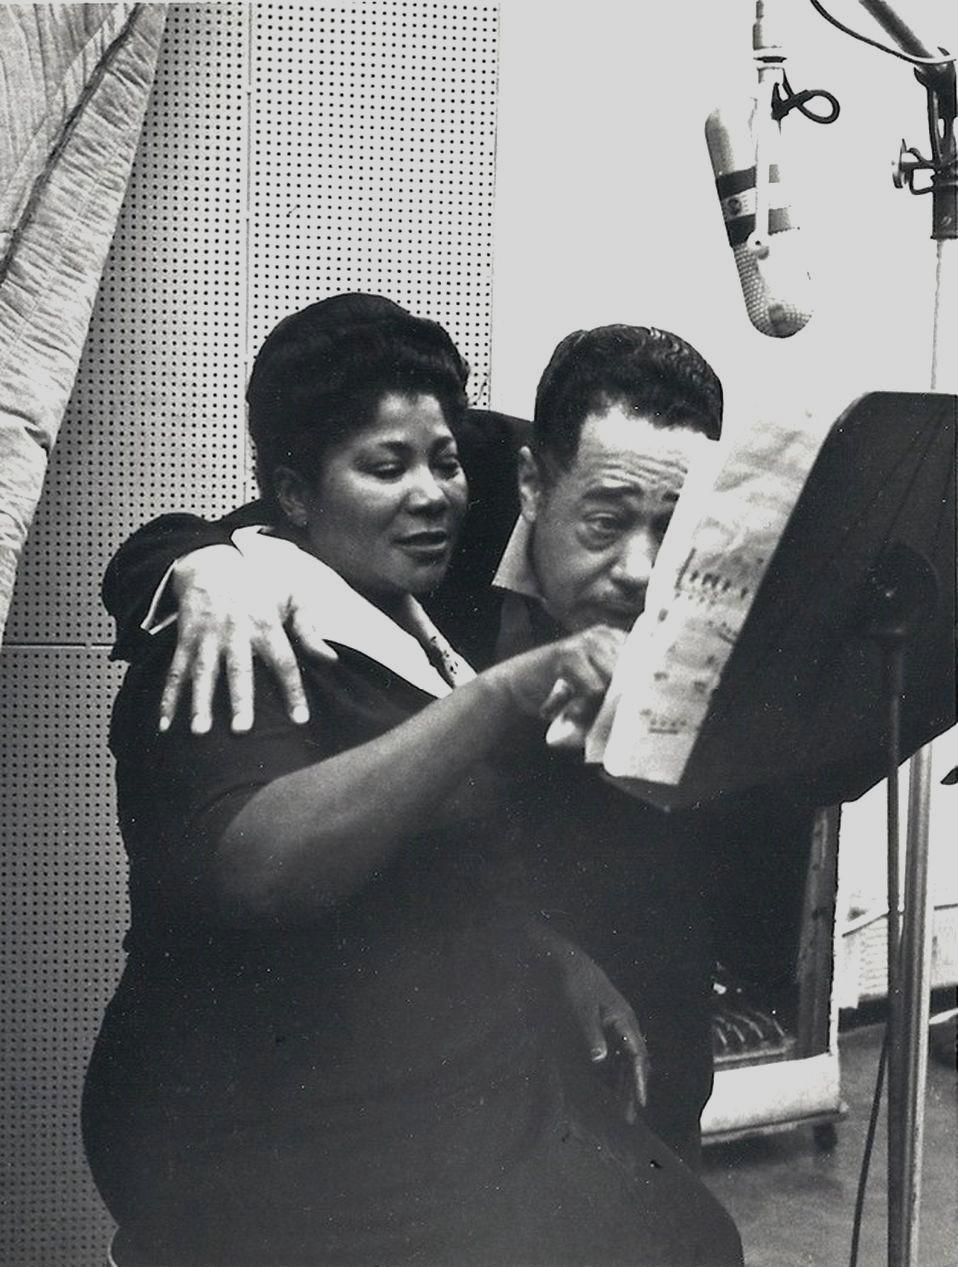 p. 276, avec Mahalia Jackson, 1958, X, Coll. Christian Bonnet